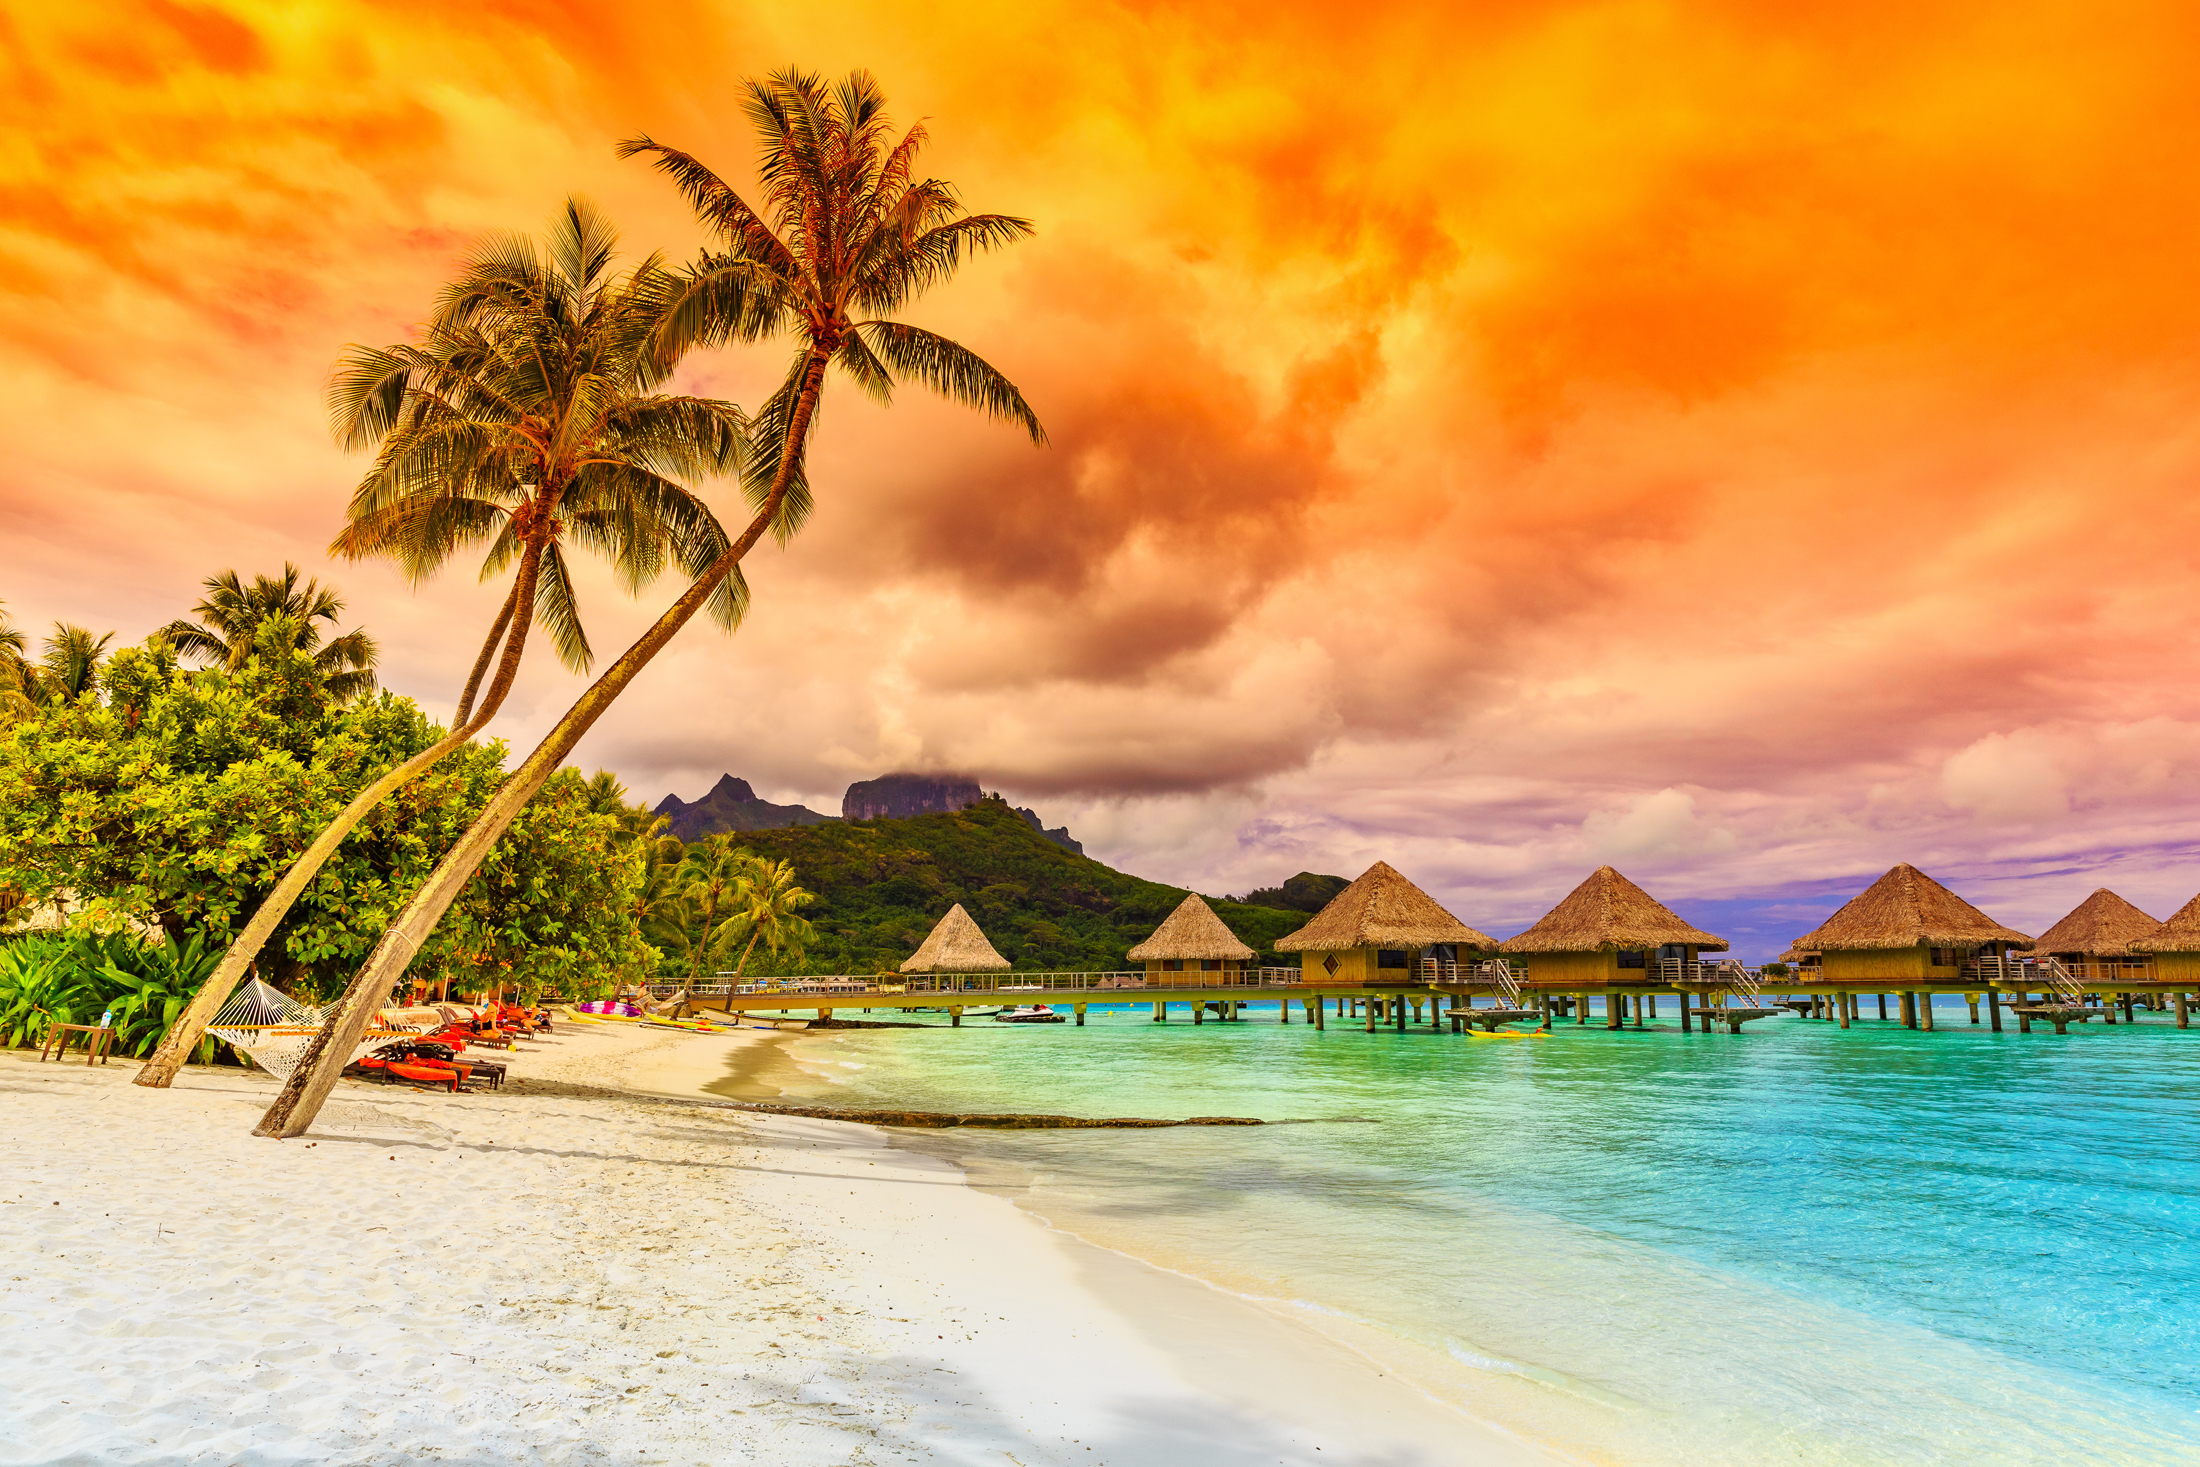 Tropical Islands HD Wallpaper New Tab Theme